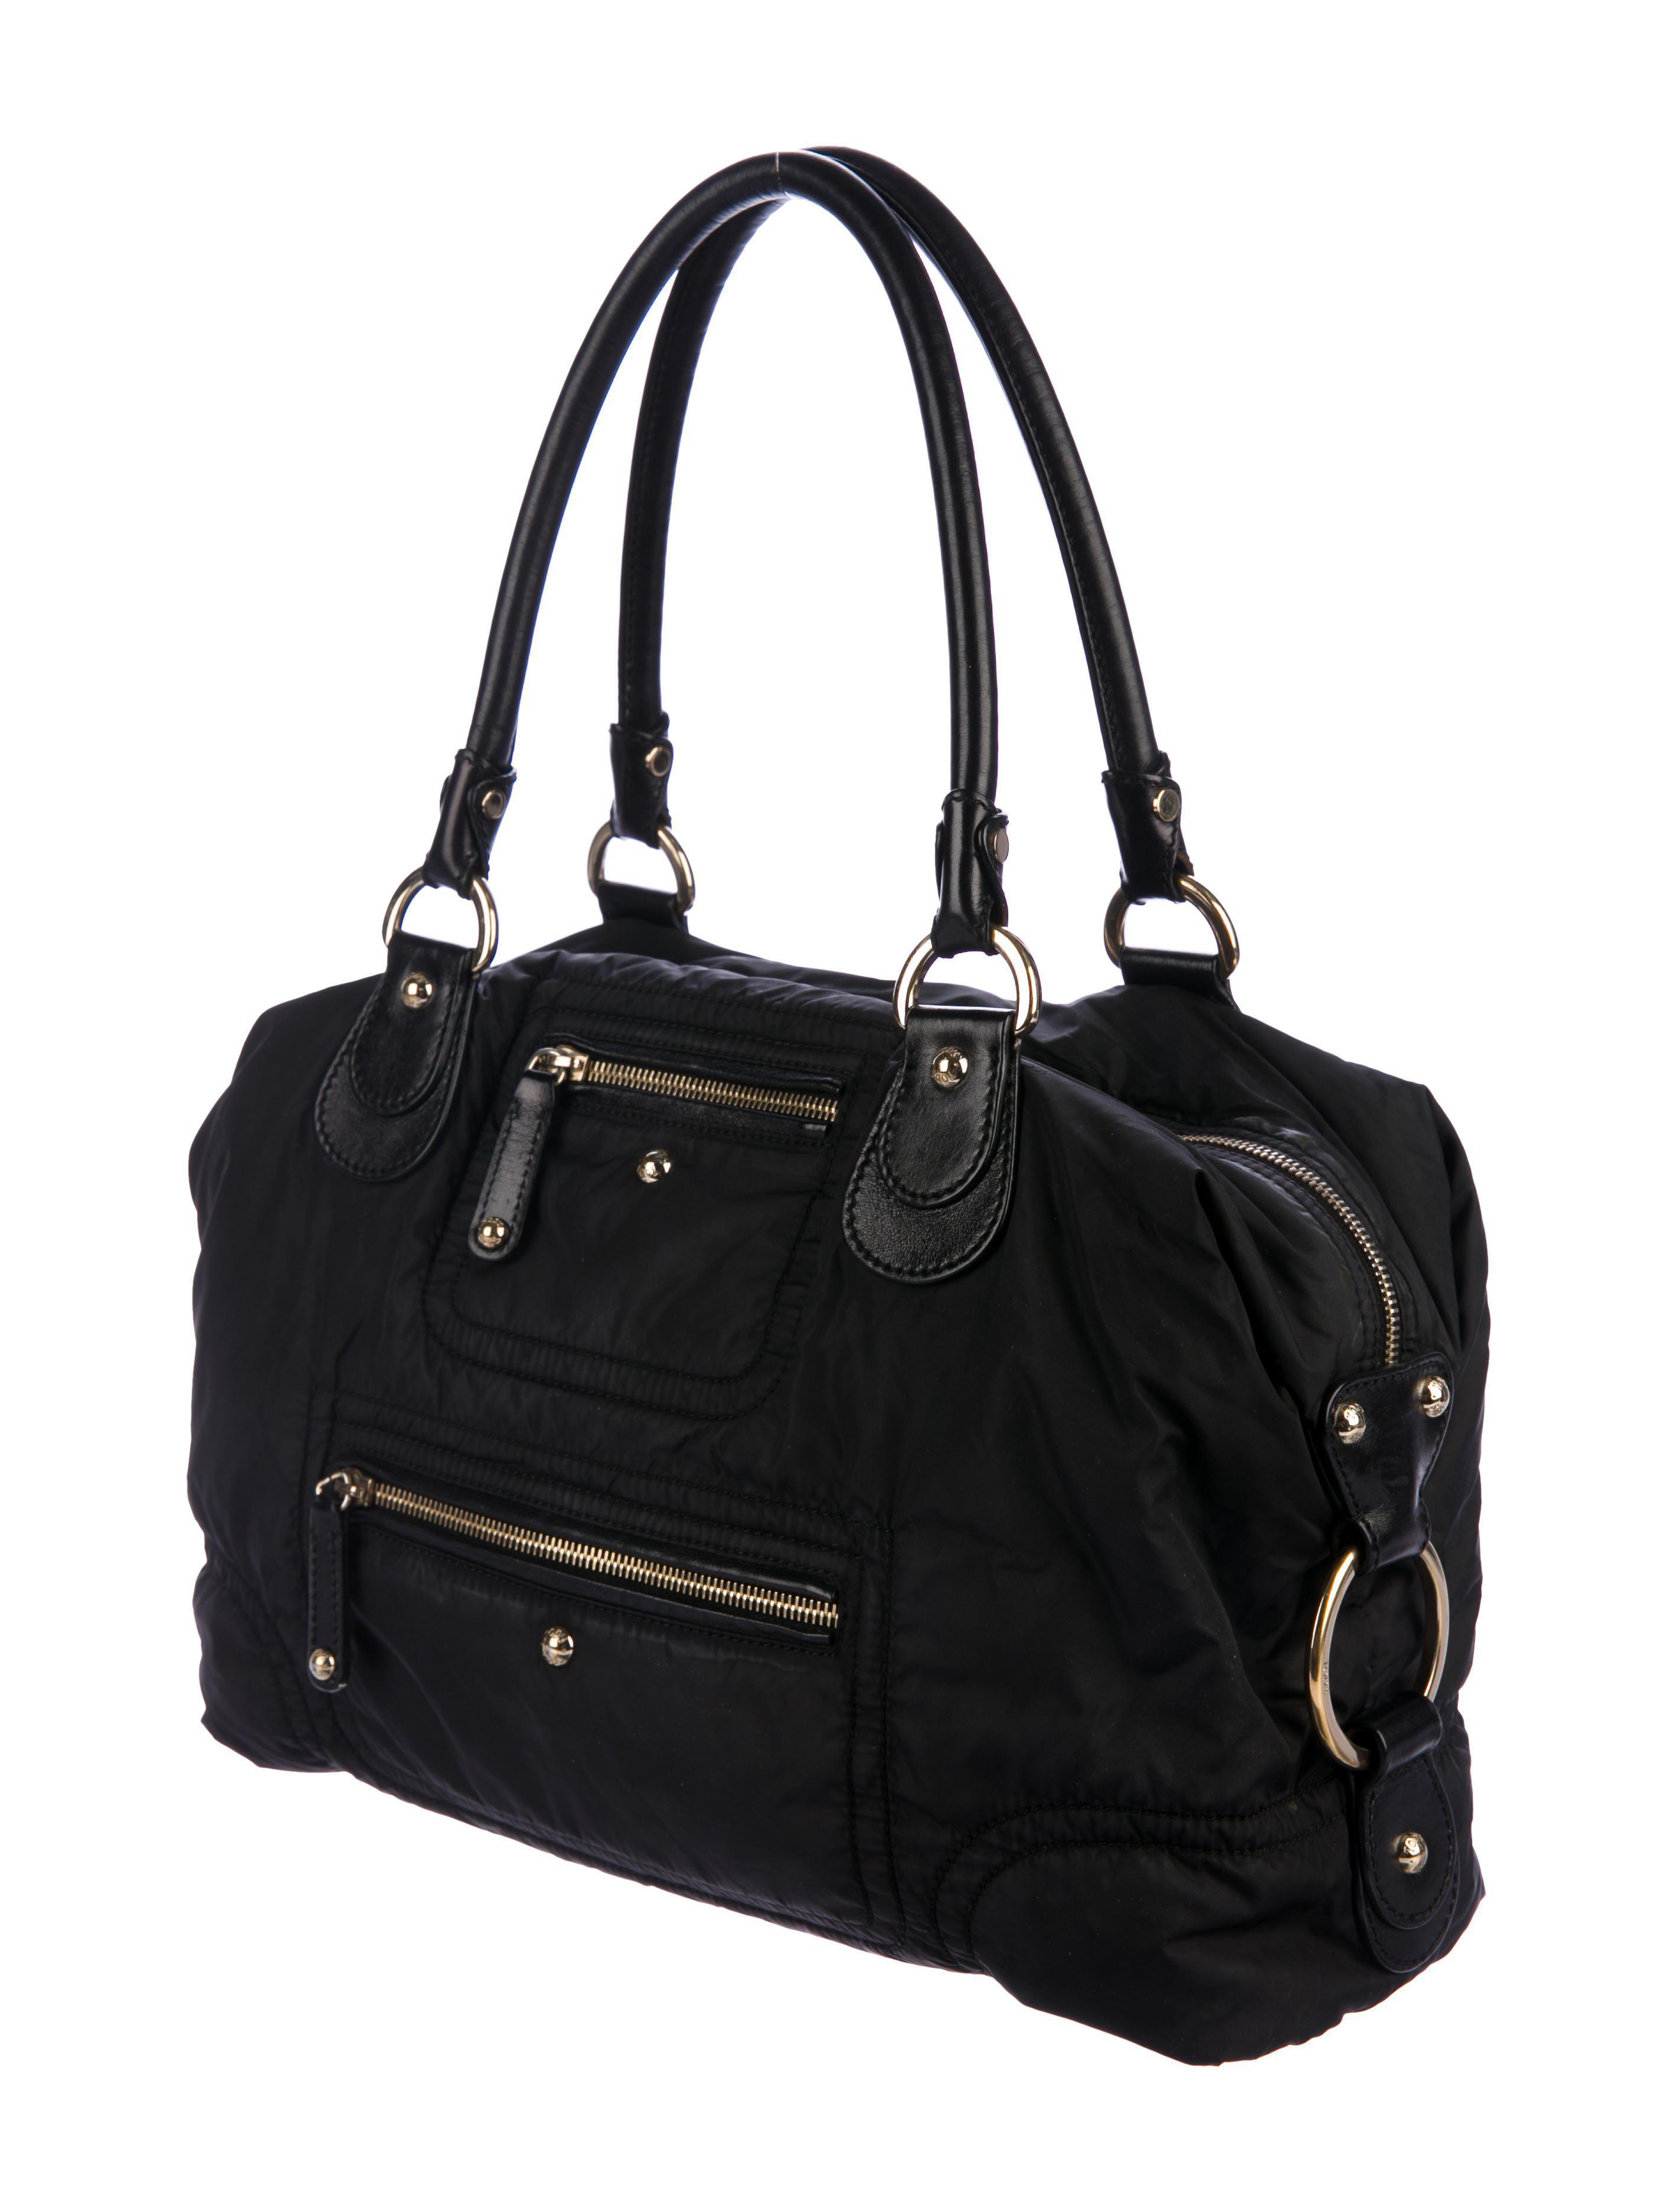 248d0f31dd8 Lyst - Tod'S Luna Pashmy Bag Black in Metallic